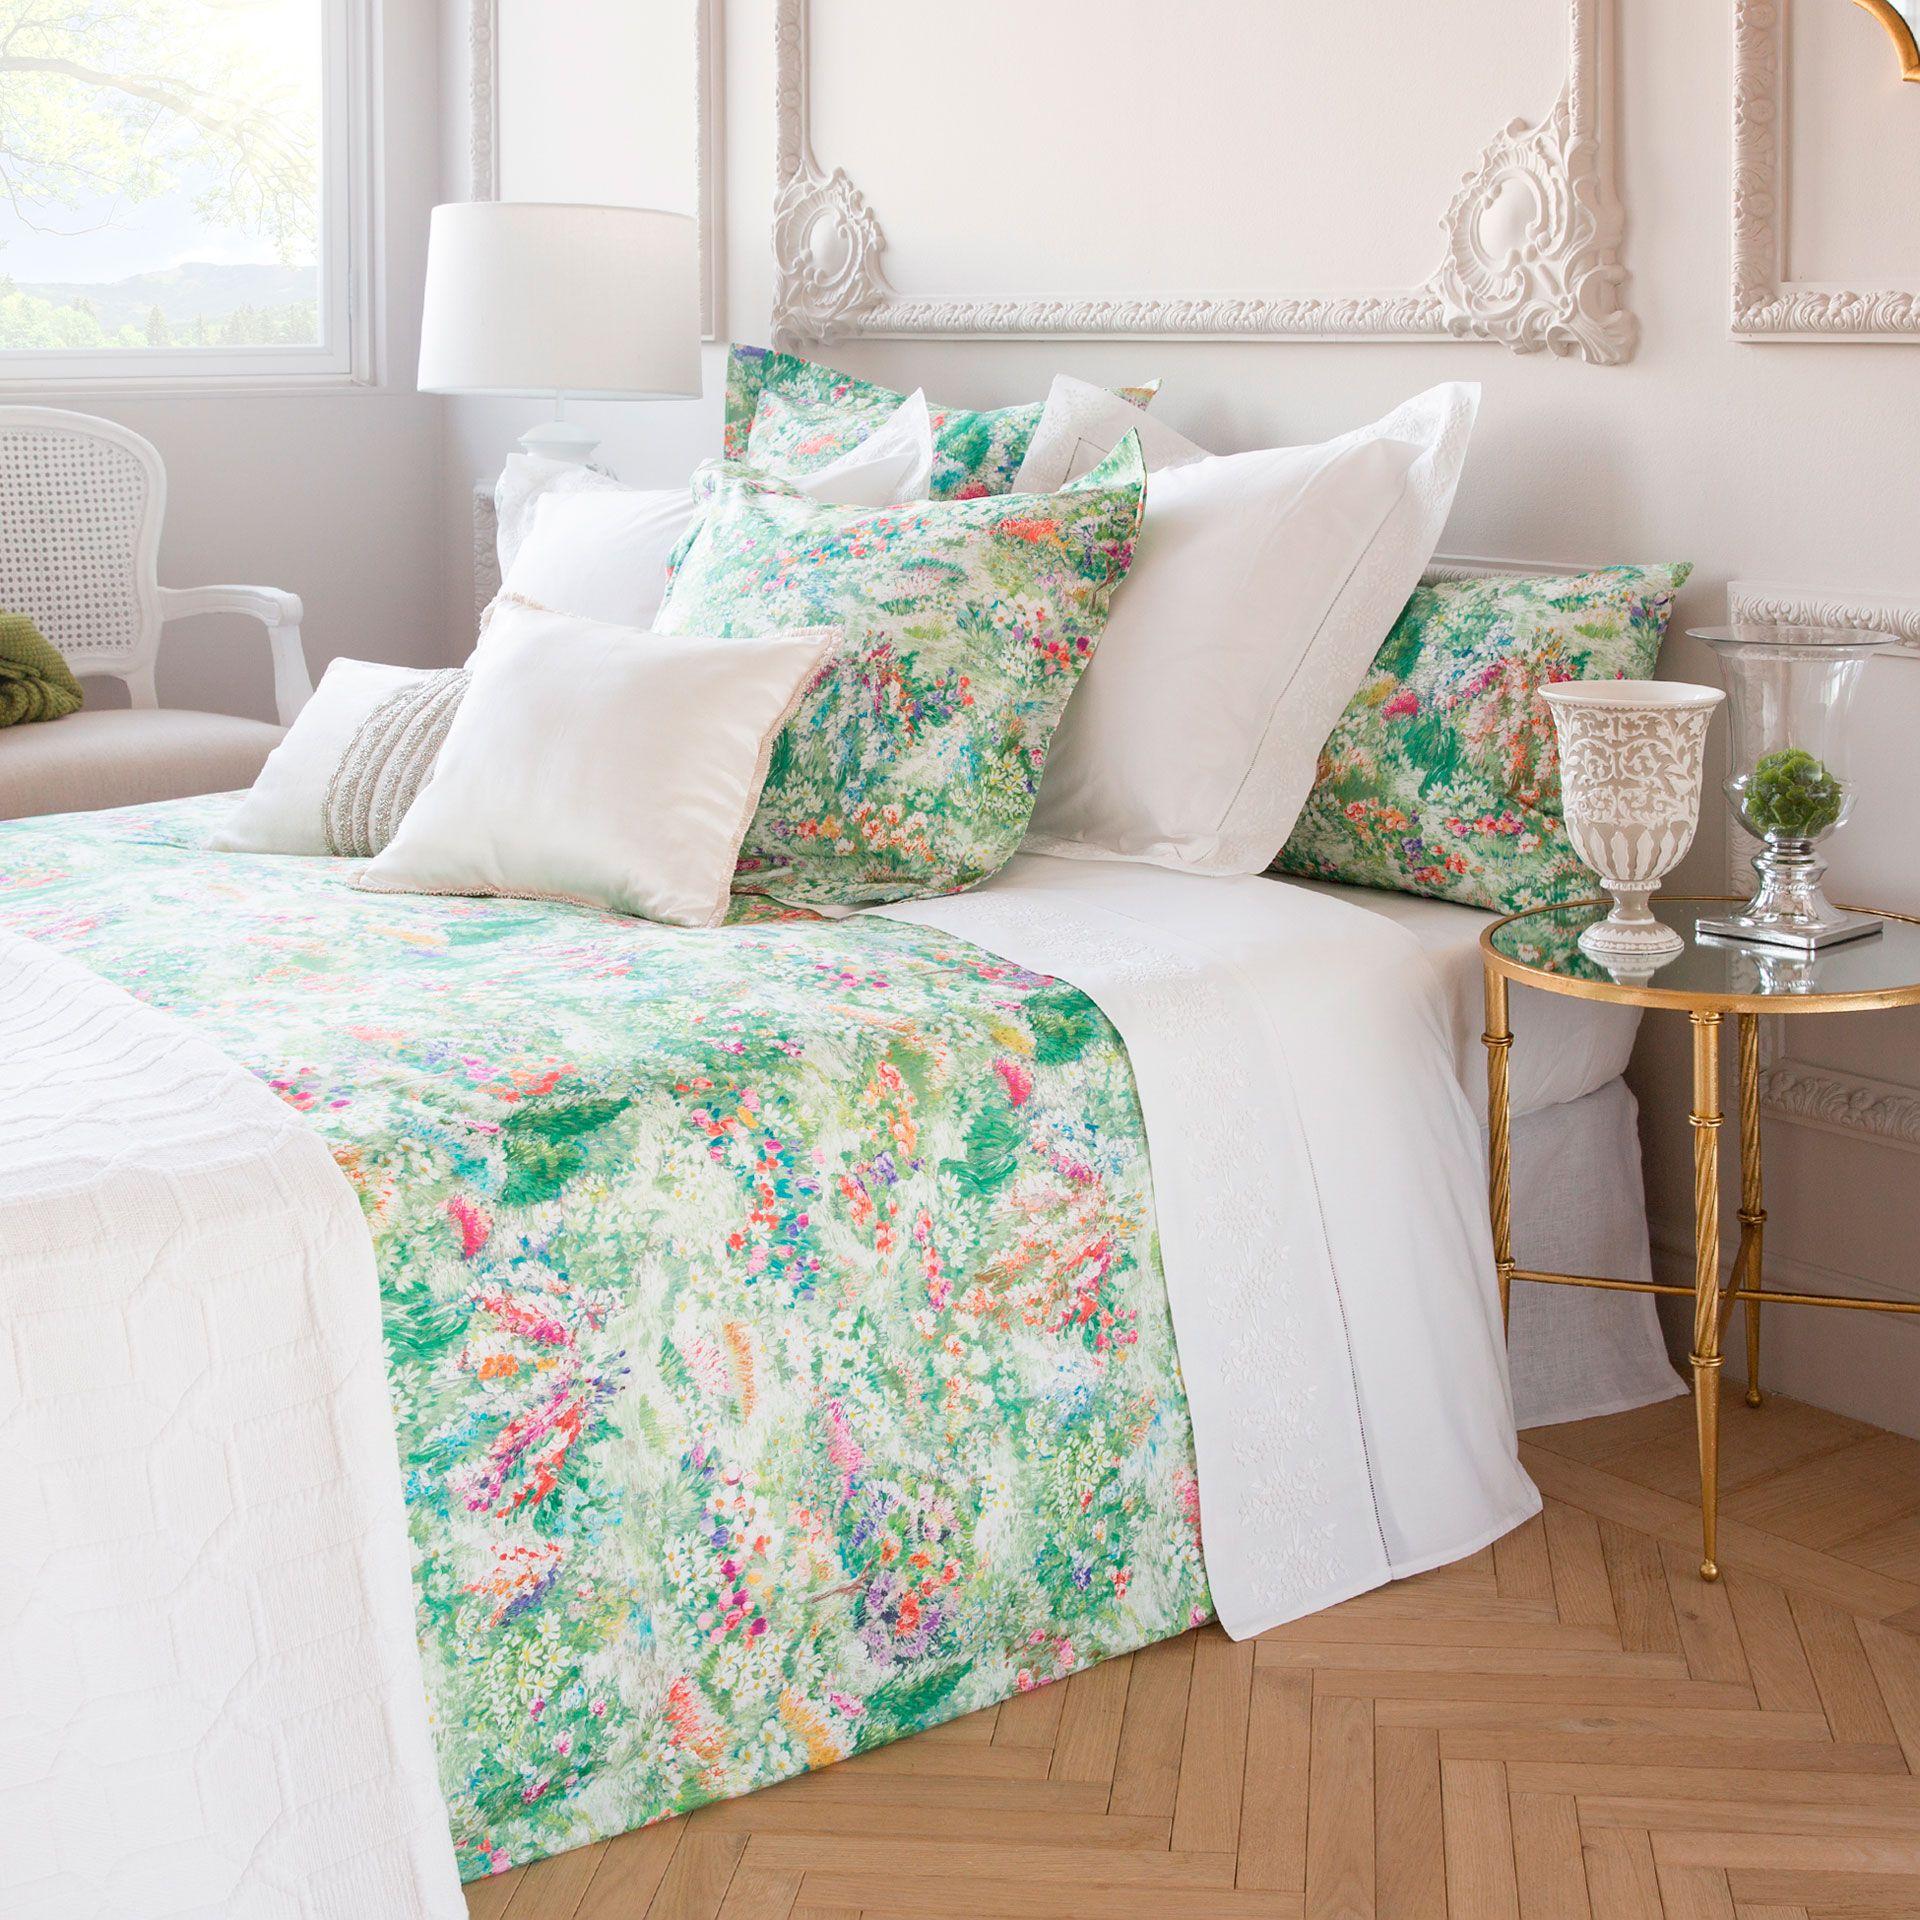 MULTICOLOUR FLORAL PRINT PERCALE BEDLINEN Bed